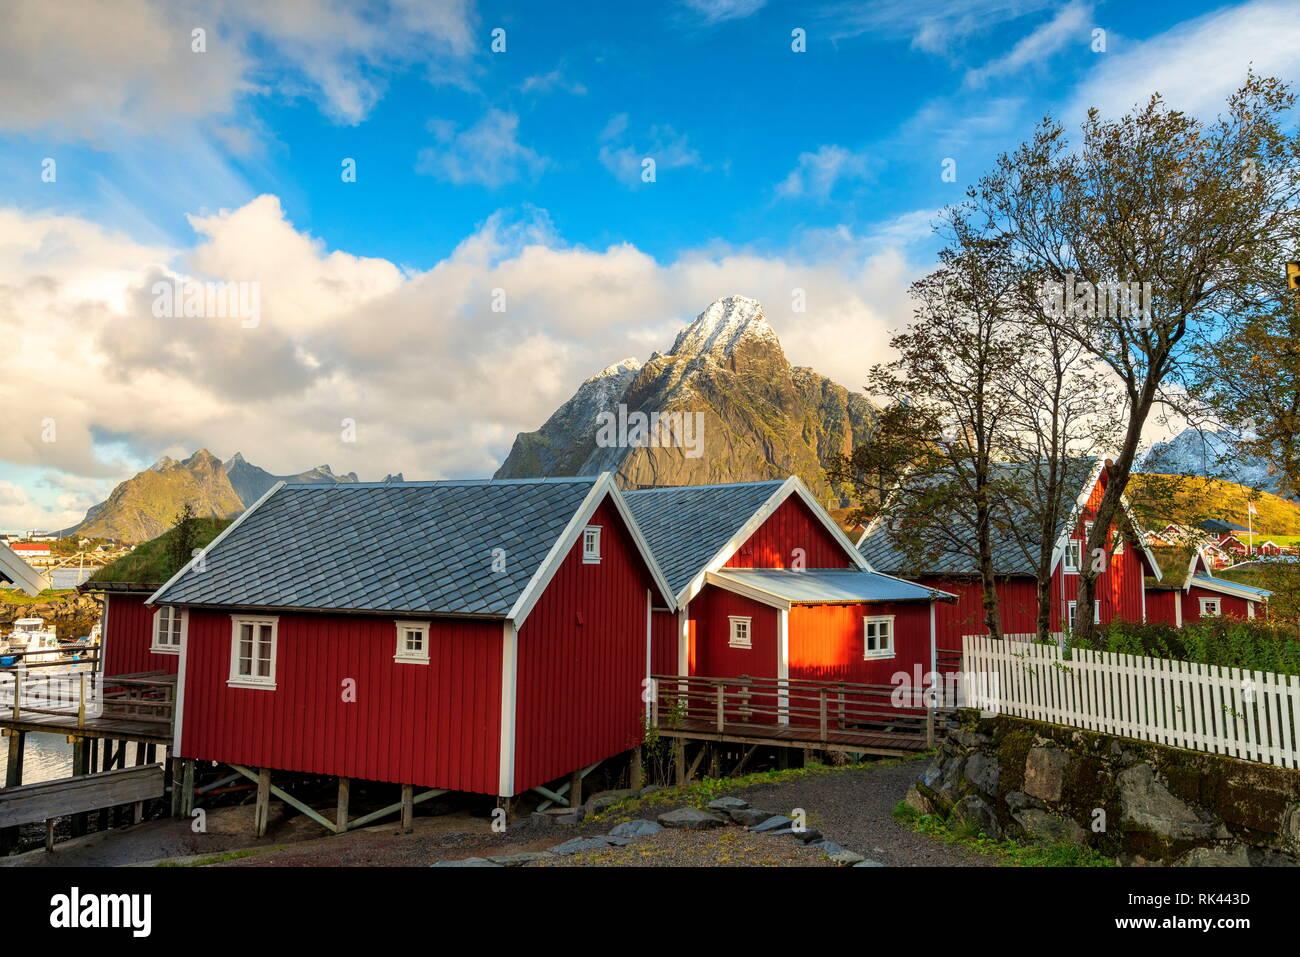 Iconic Rorbu with Mount Olstind (Olstinden) in the background, Reine, Moskenes, Nordland, Lofoten Islands, Norway Stock Photo